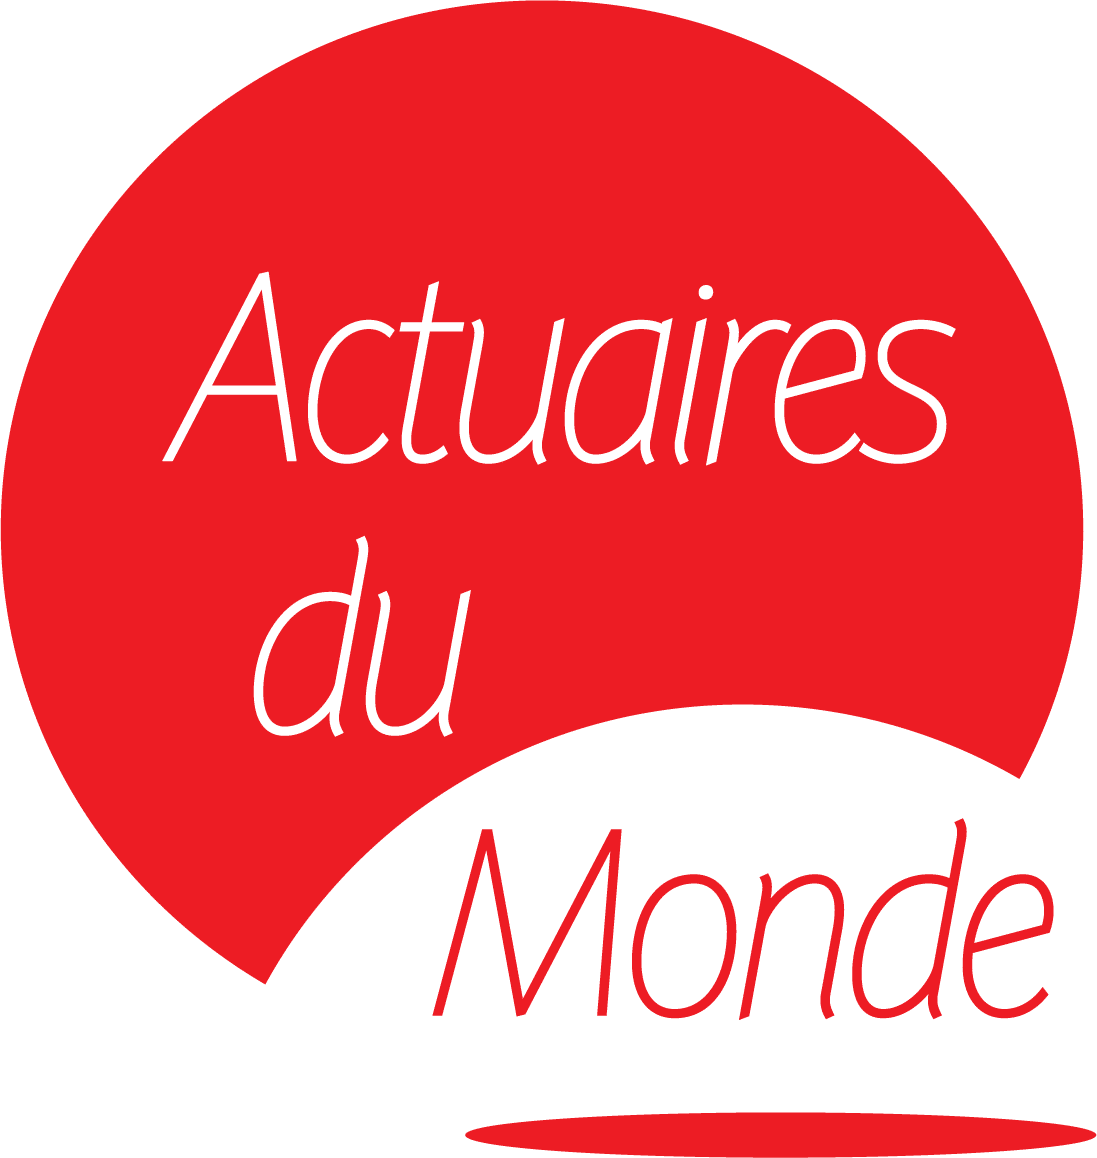 actuaires-du-monde-logo-cmyk_final-1605864234-1607702337